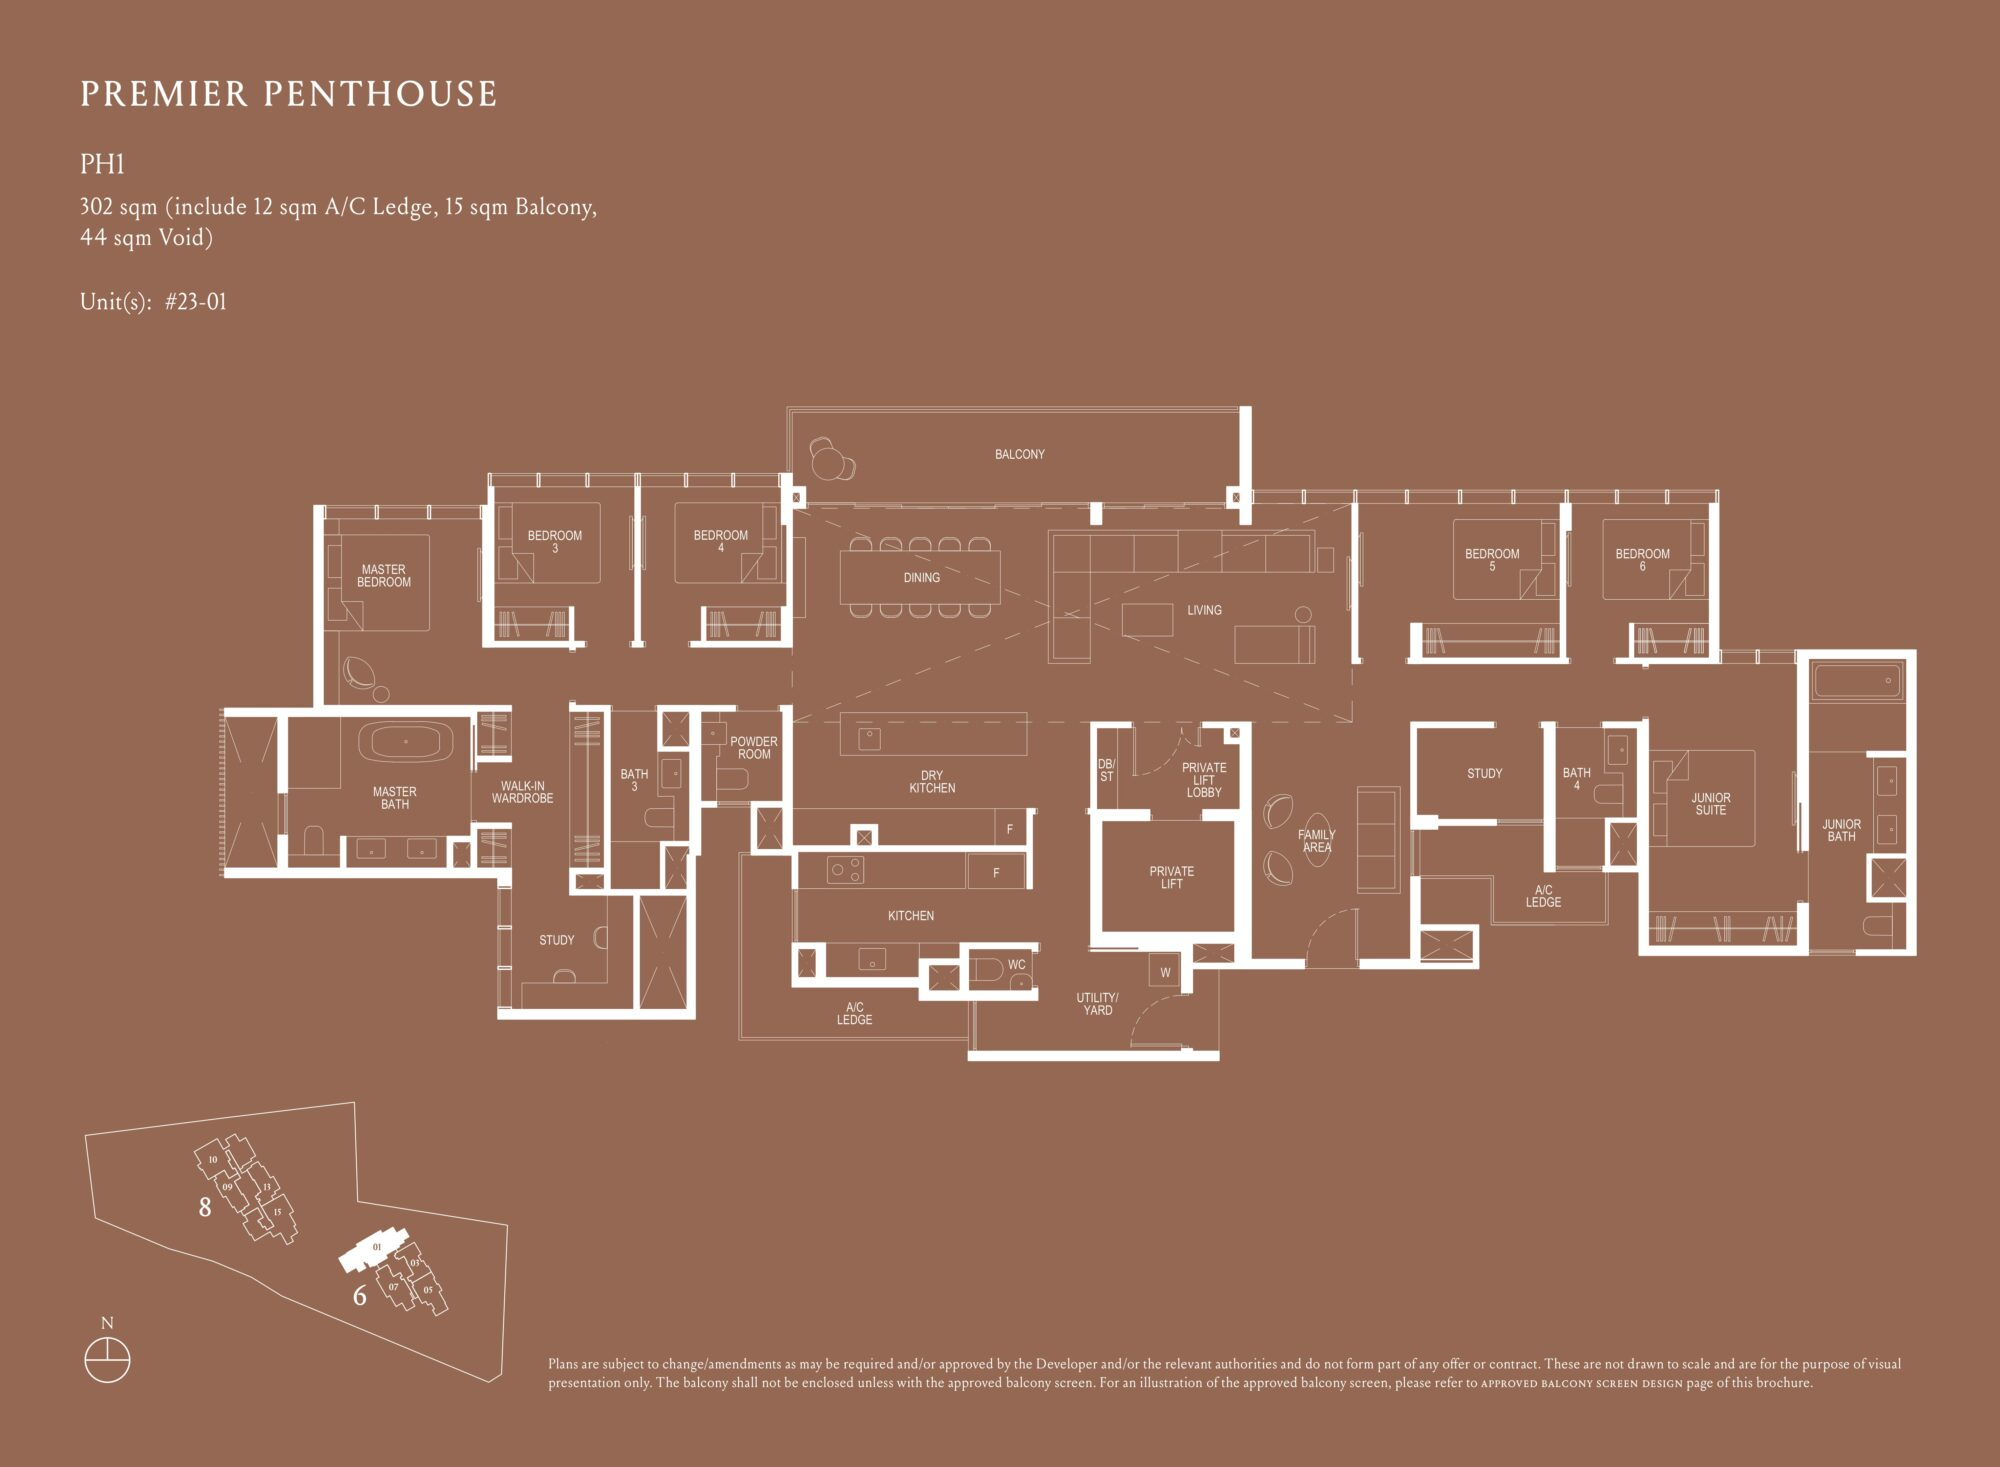 Kopar At Newton 纽顿铜源 premier penthouse 302 sqm PH1 floor plan